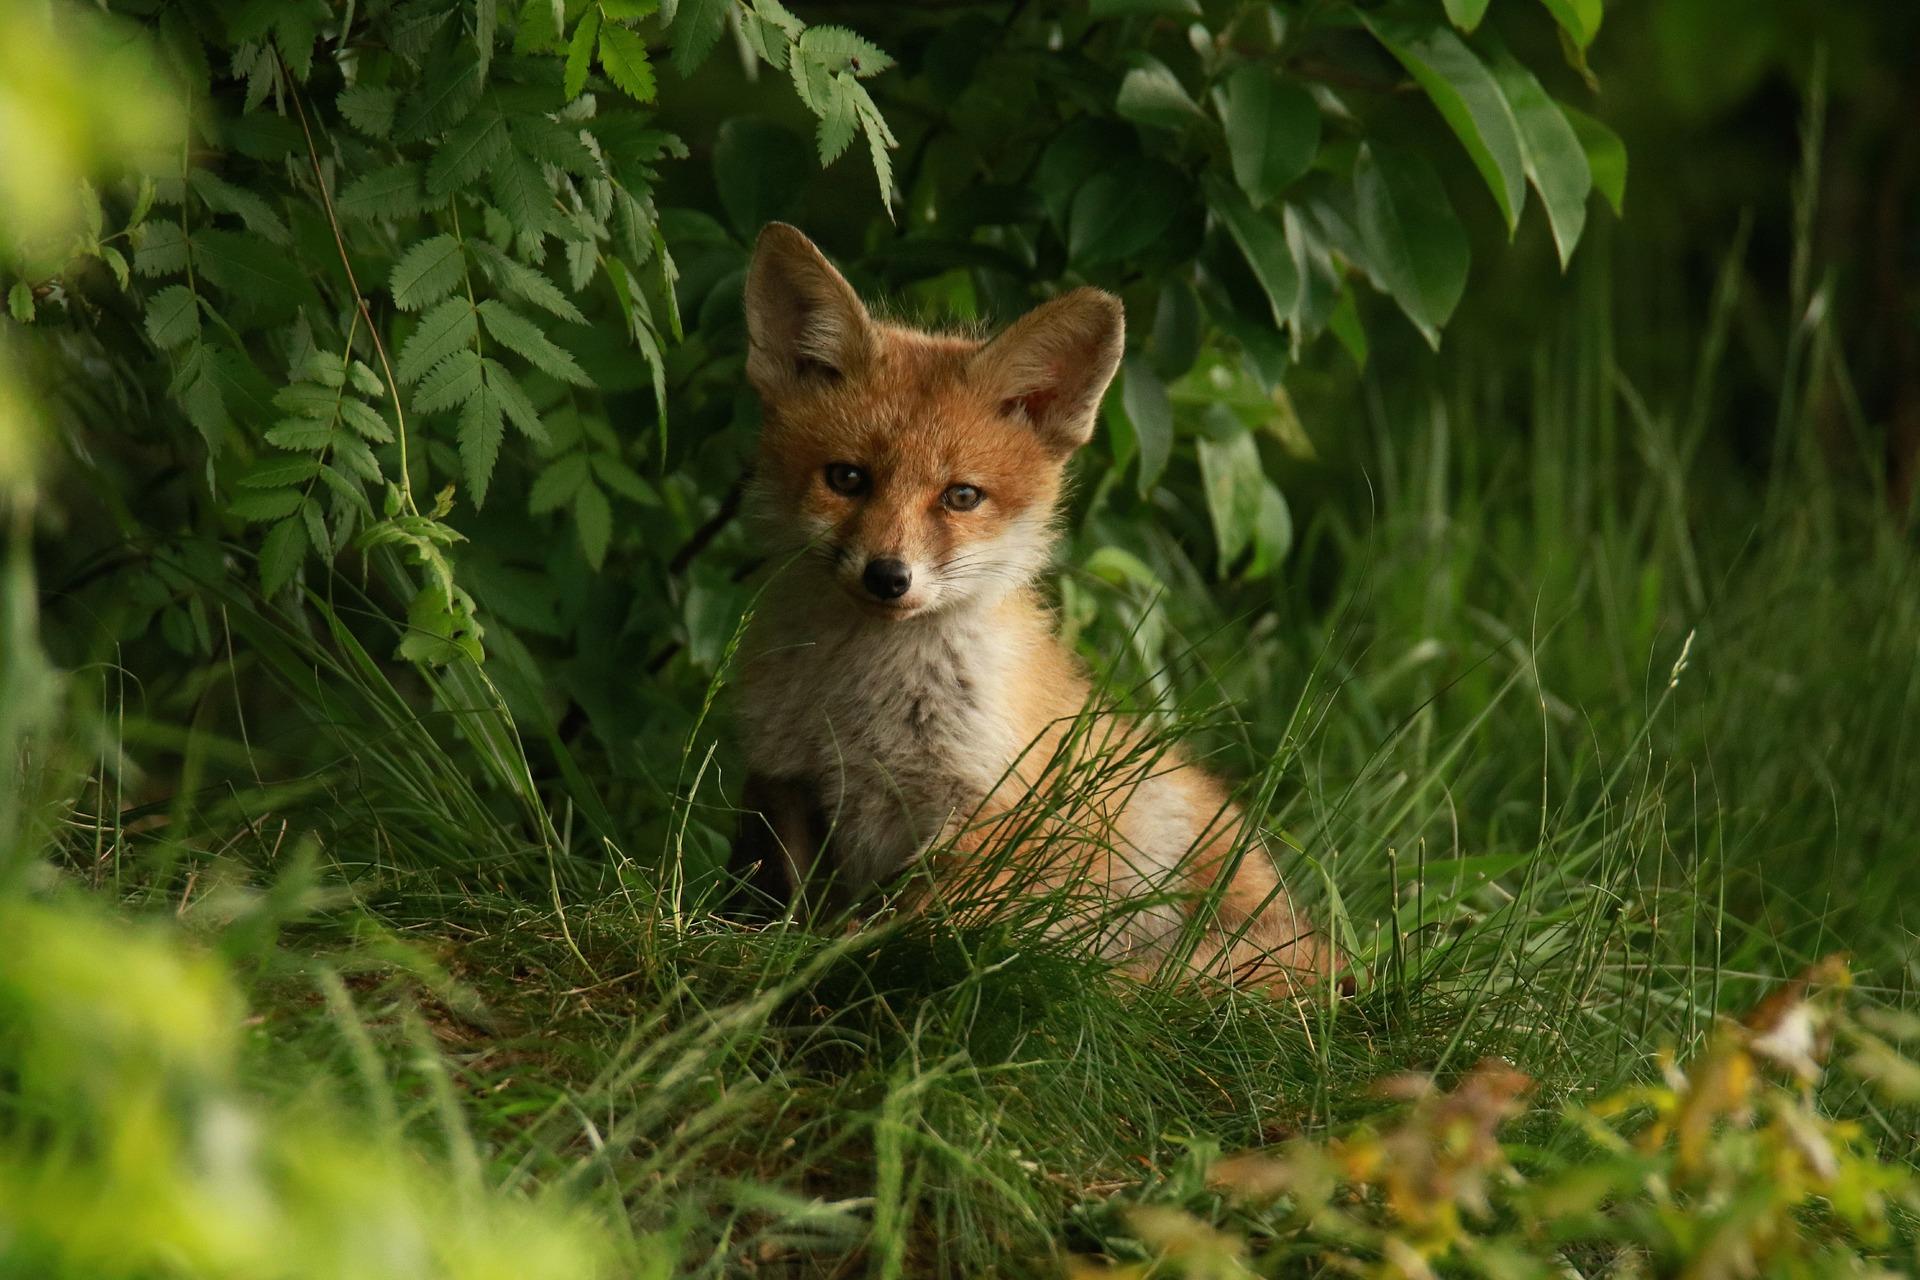 download wallpaper: vosje in het bos wallpaper